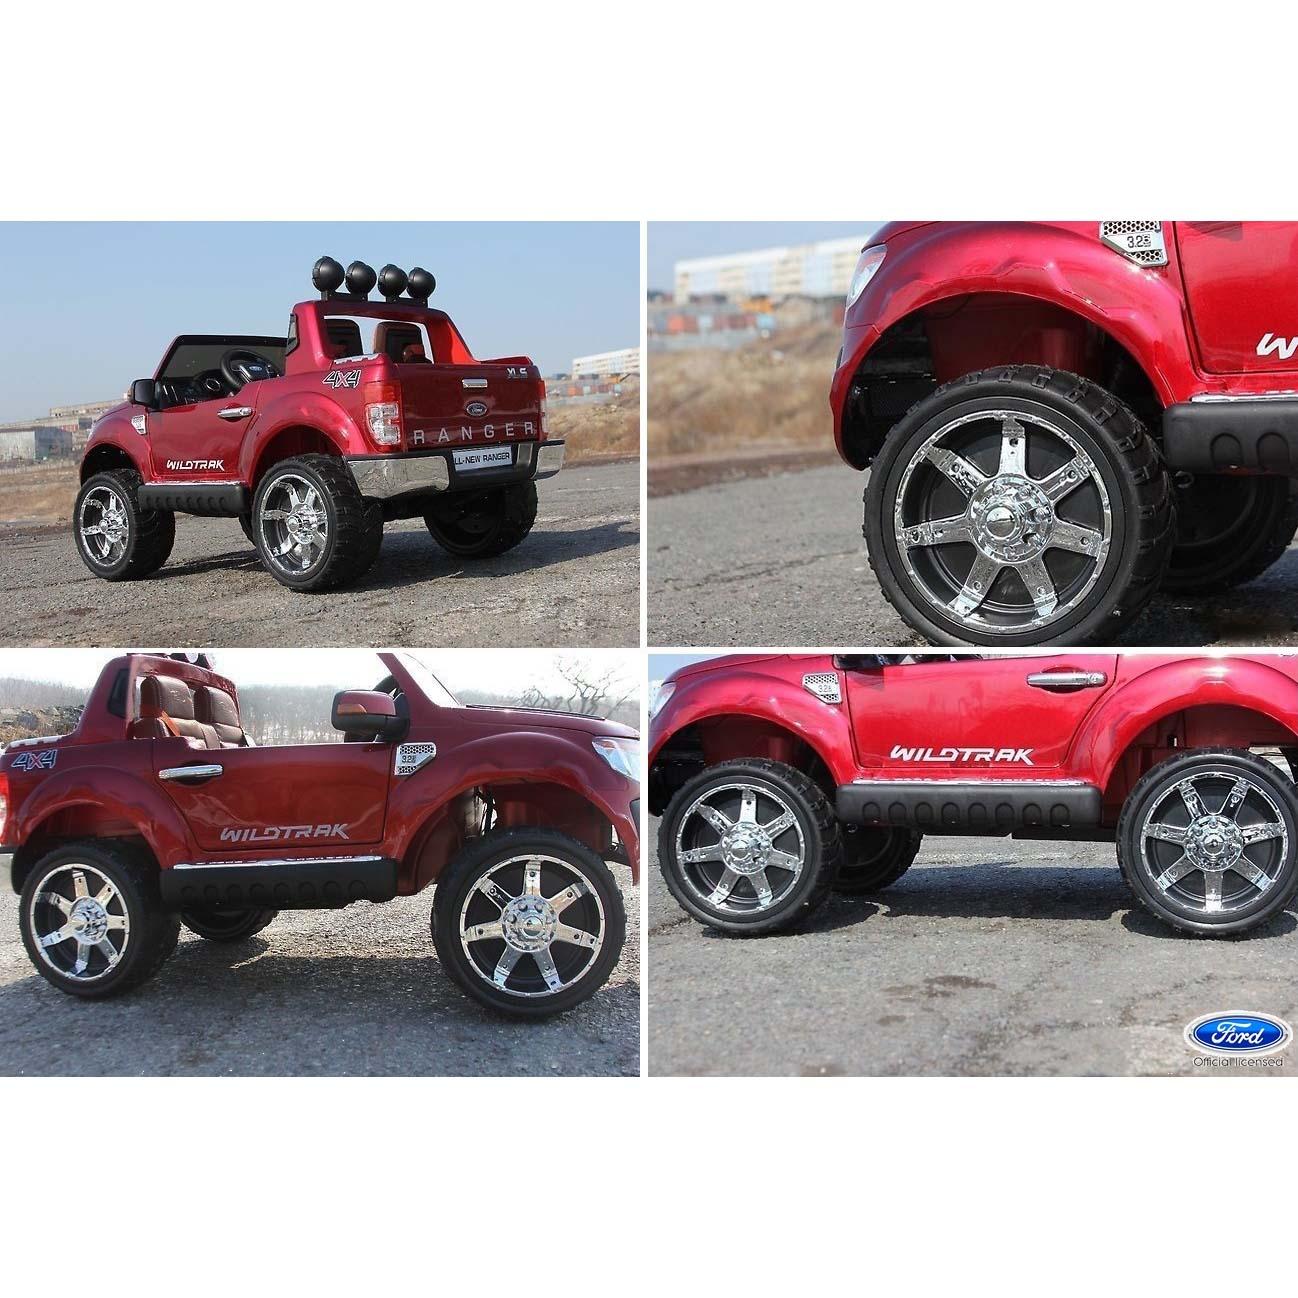 электромобиль форд 150 #9